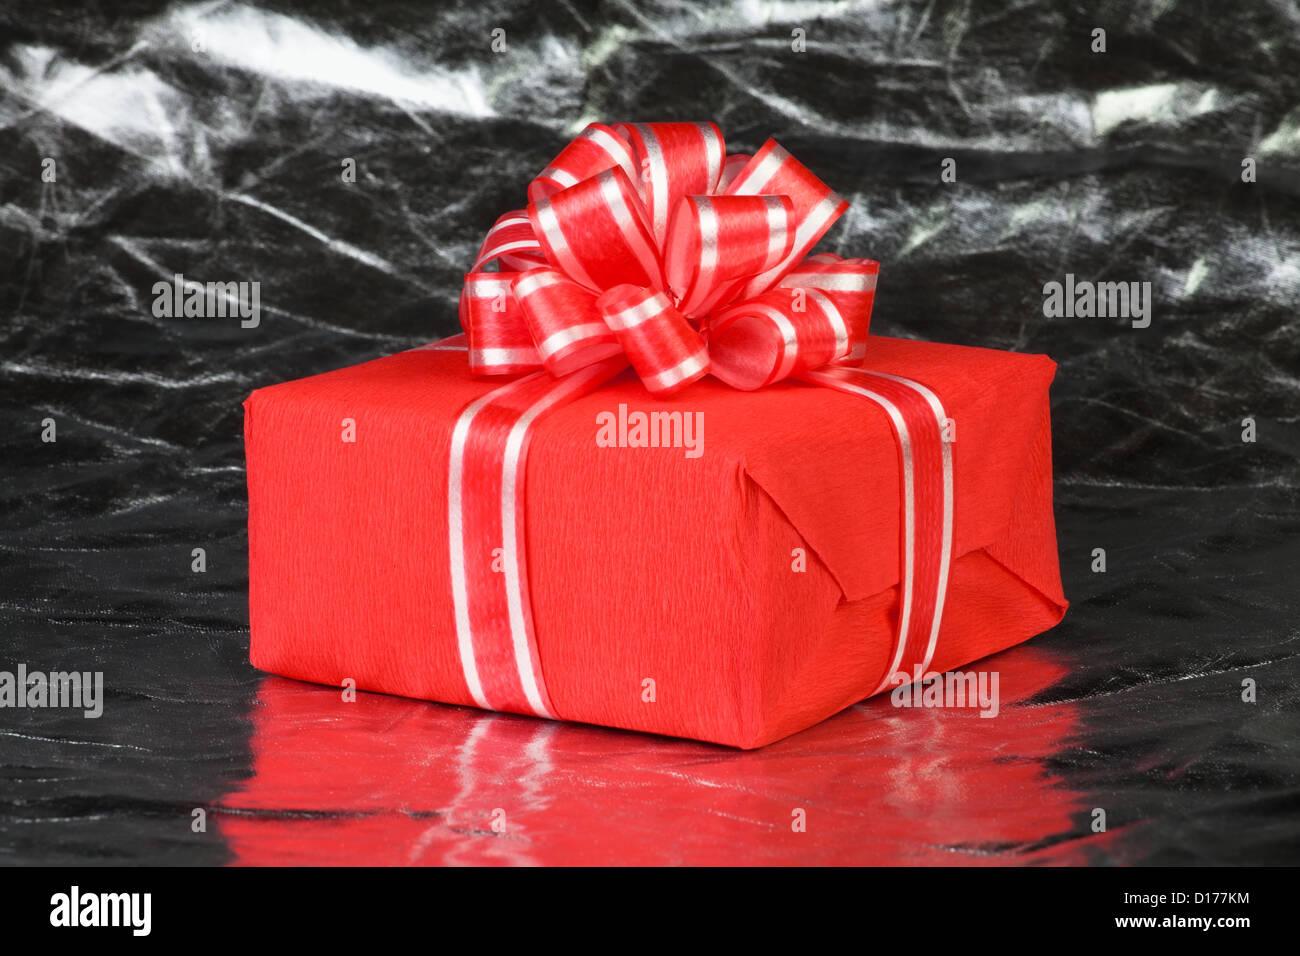 Caja de regalo roja presentes en plata Imagen De Stock